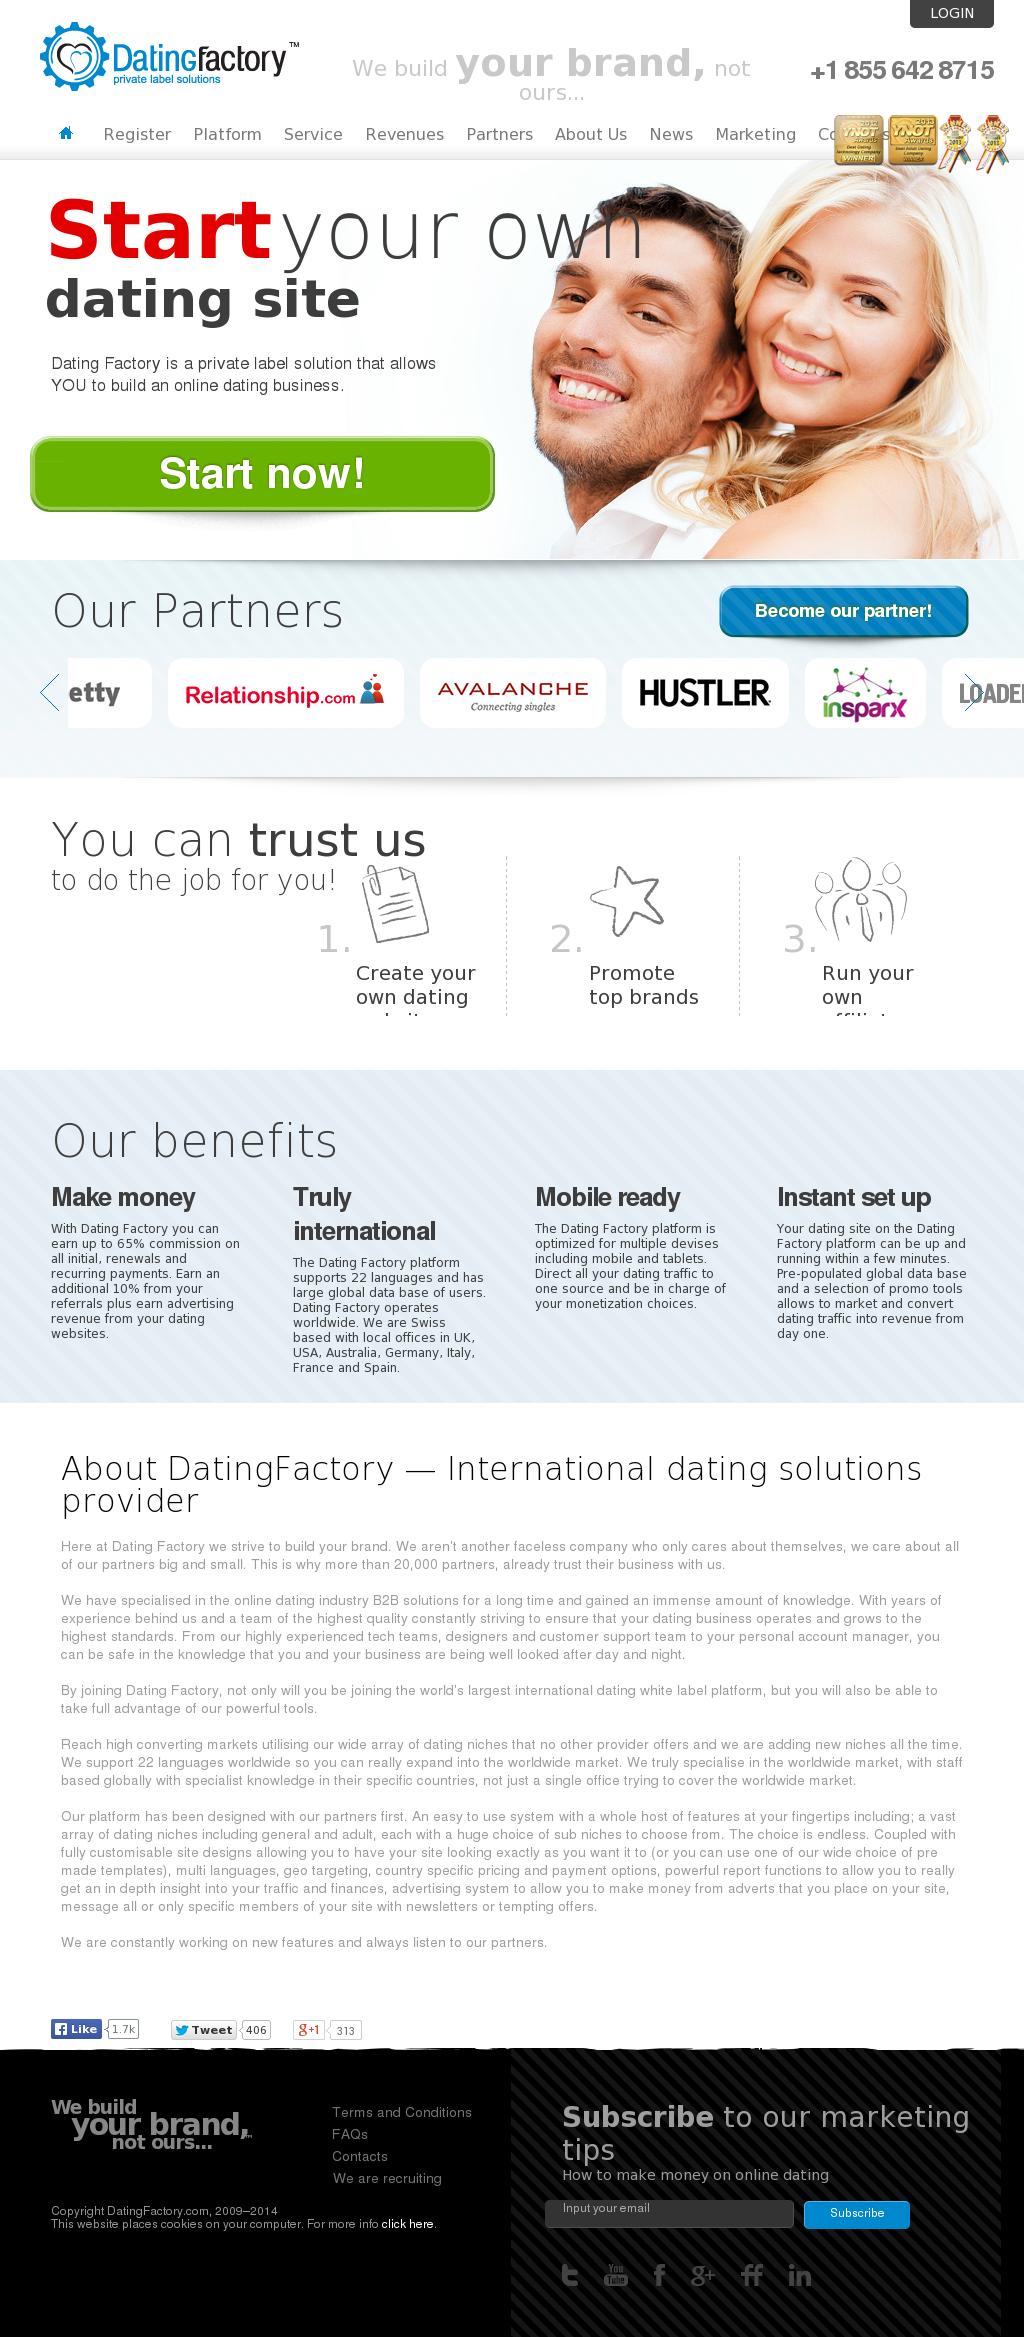 Private label dating provider